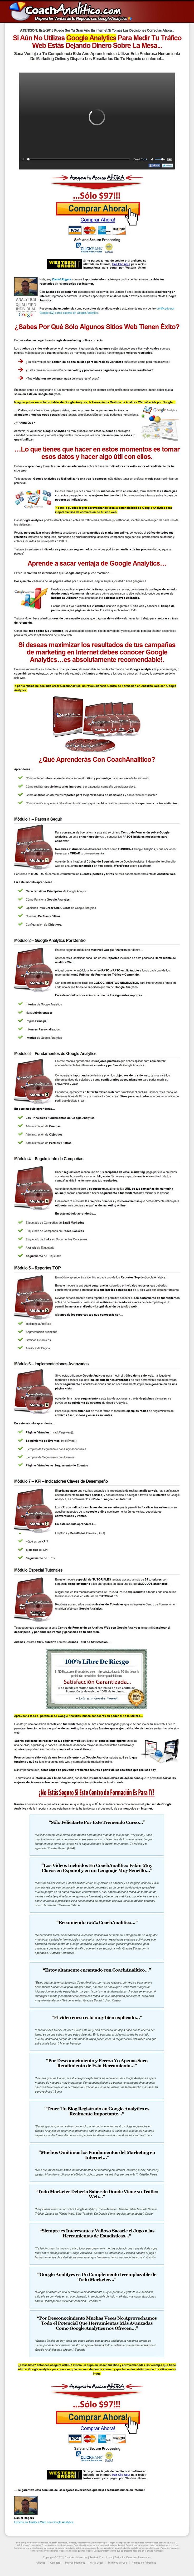 driving school semi pinterest trucks prices and cabinas on marco peterbilt ferrari pin by cdl ramirez